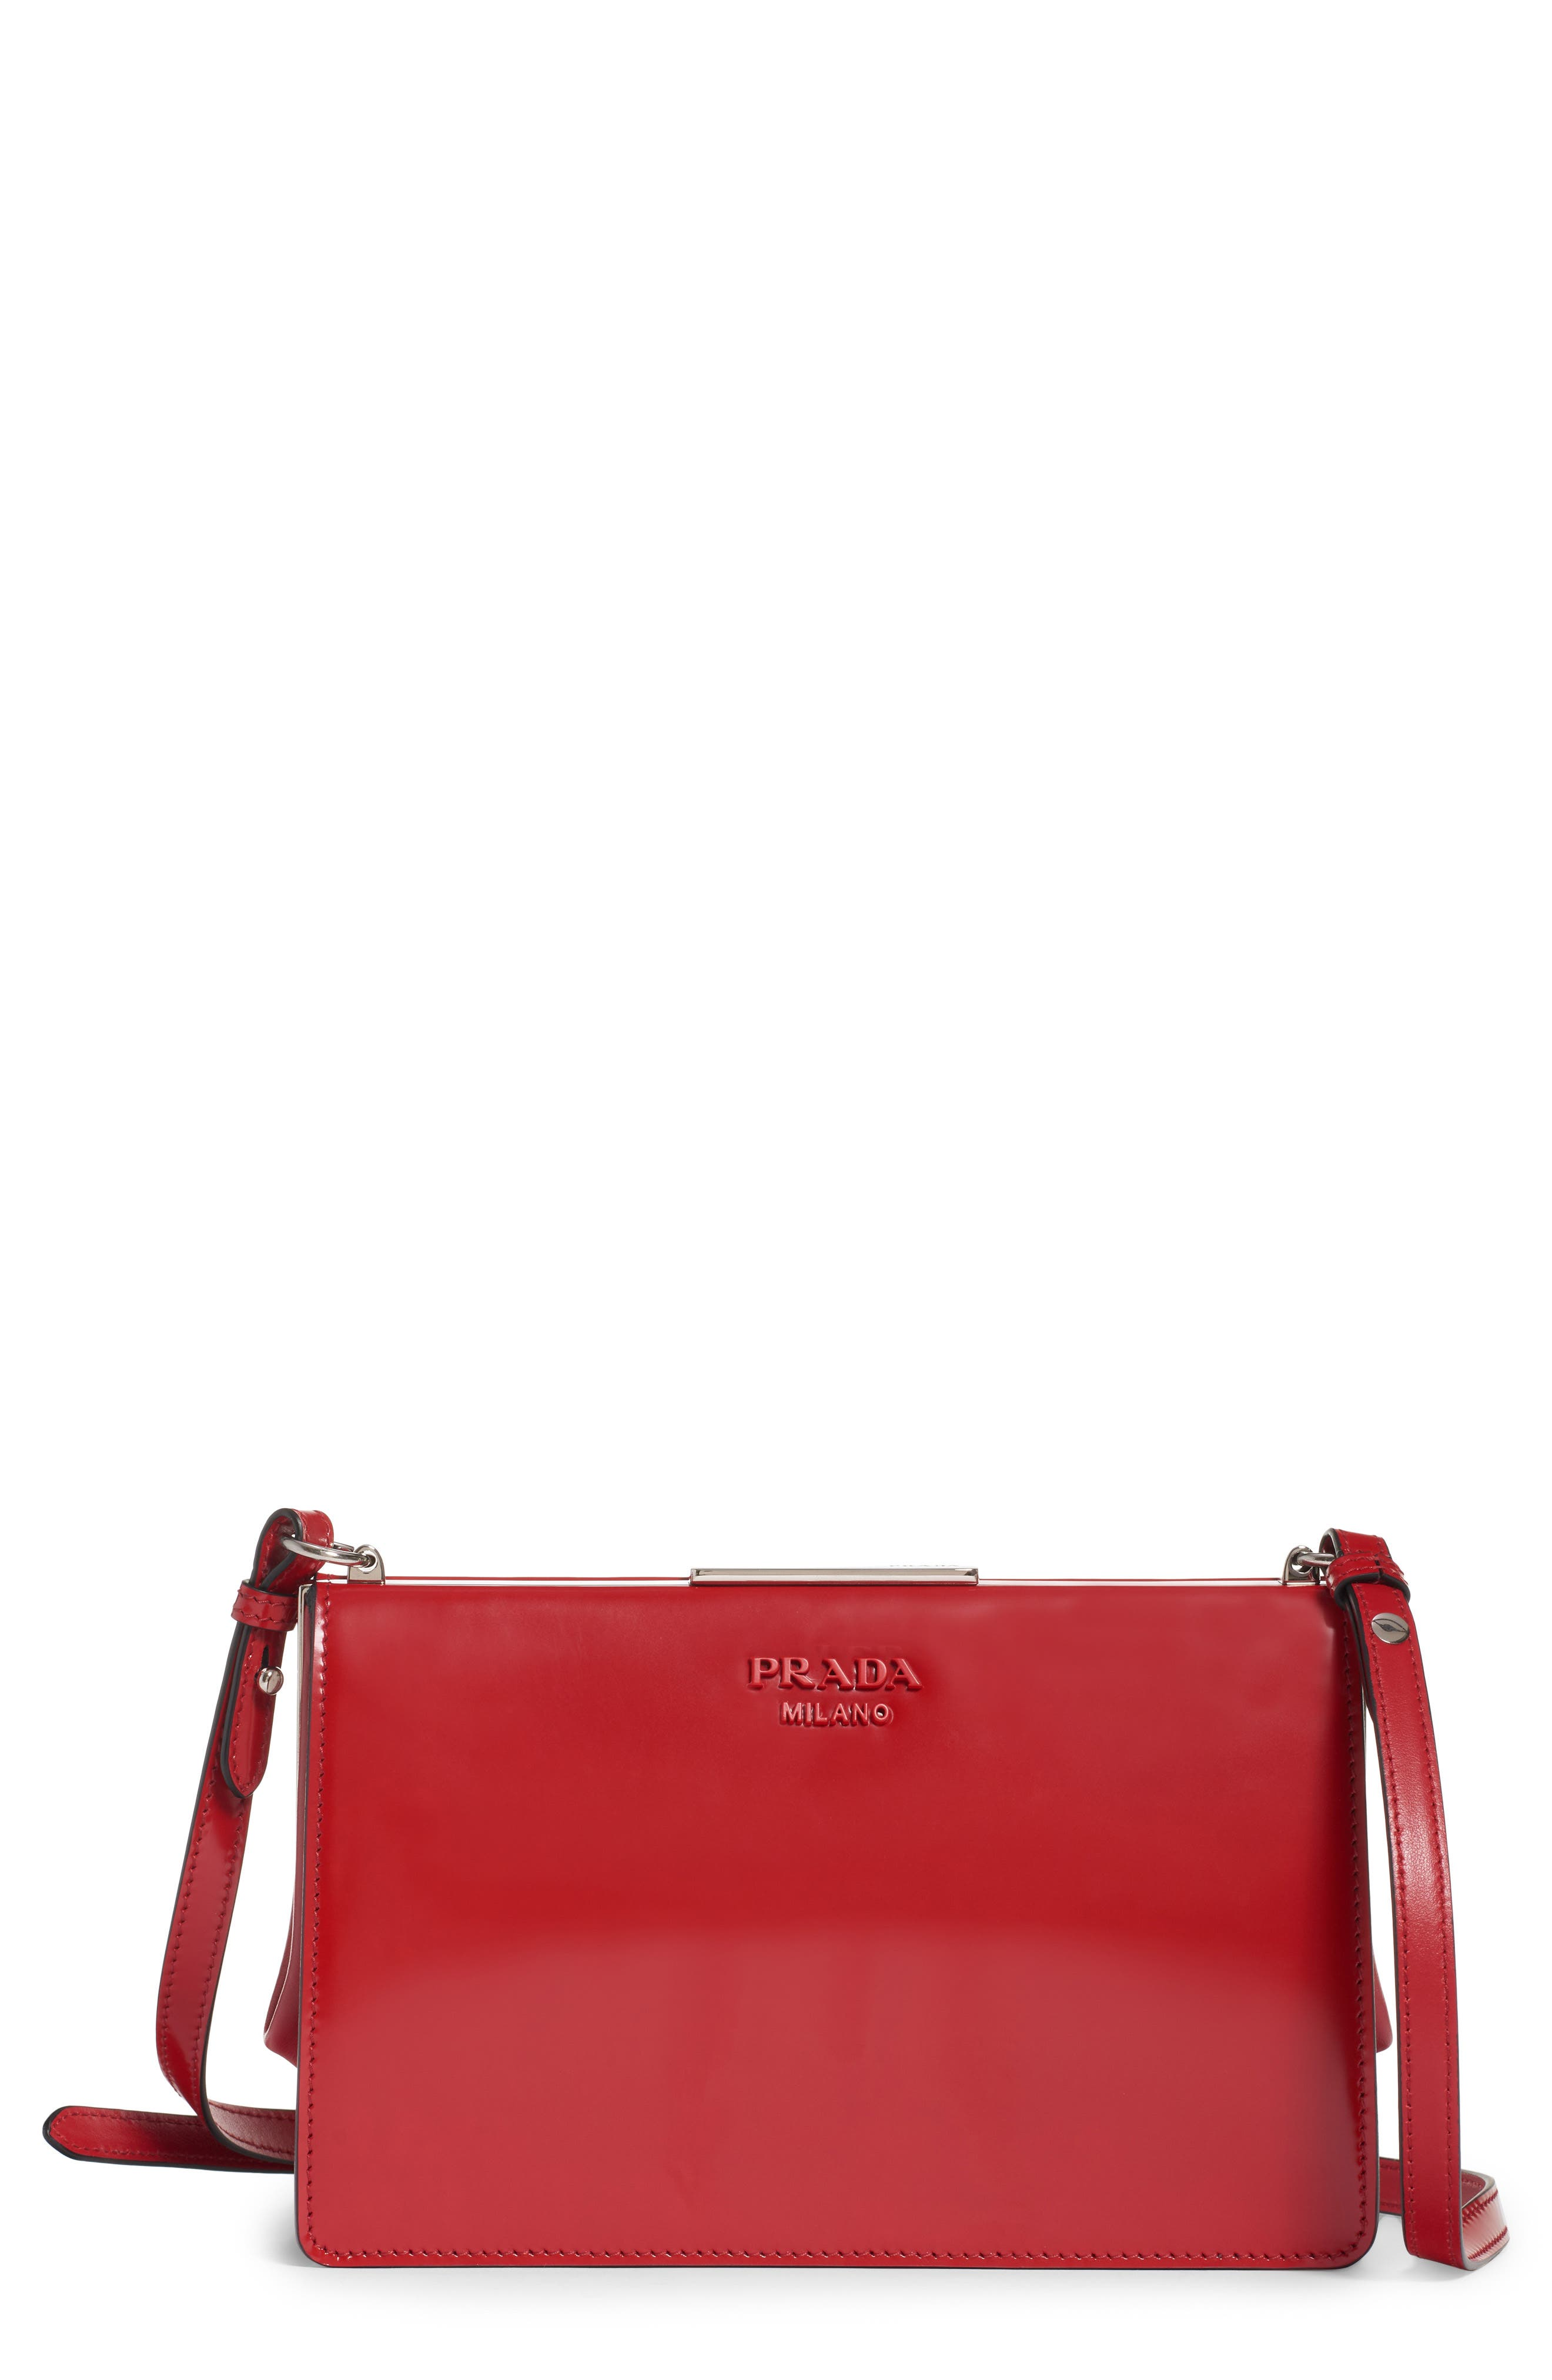 bc554a32cb1bcc ireland prada men bags bag . b1a27 db0a5; inexpensive prada calfskin  leather shoulder bag da82d 53675